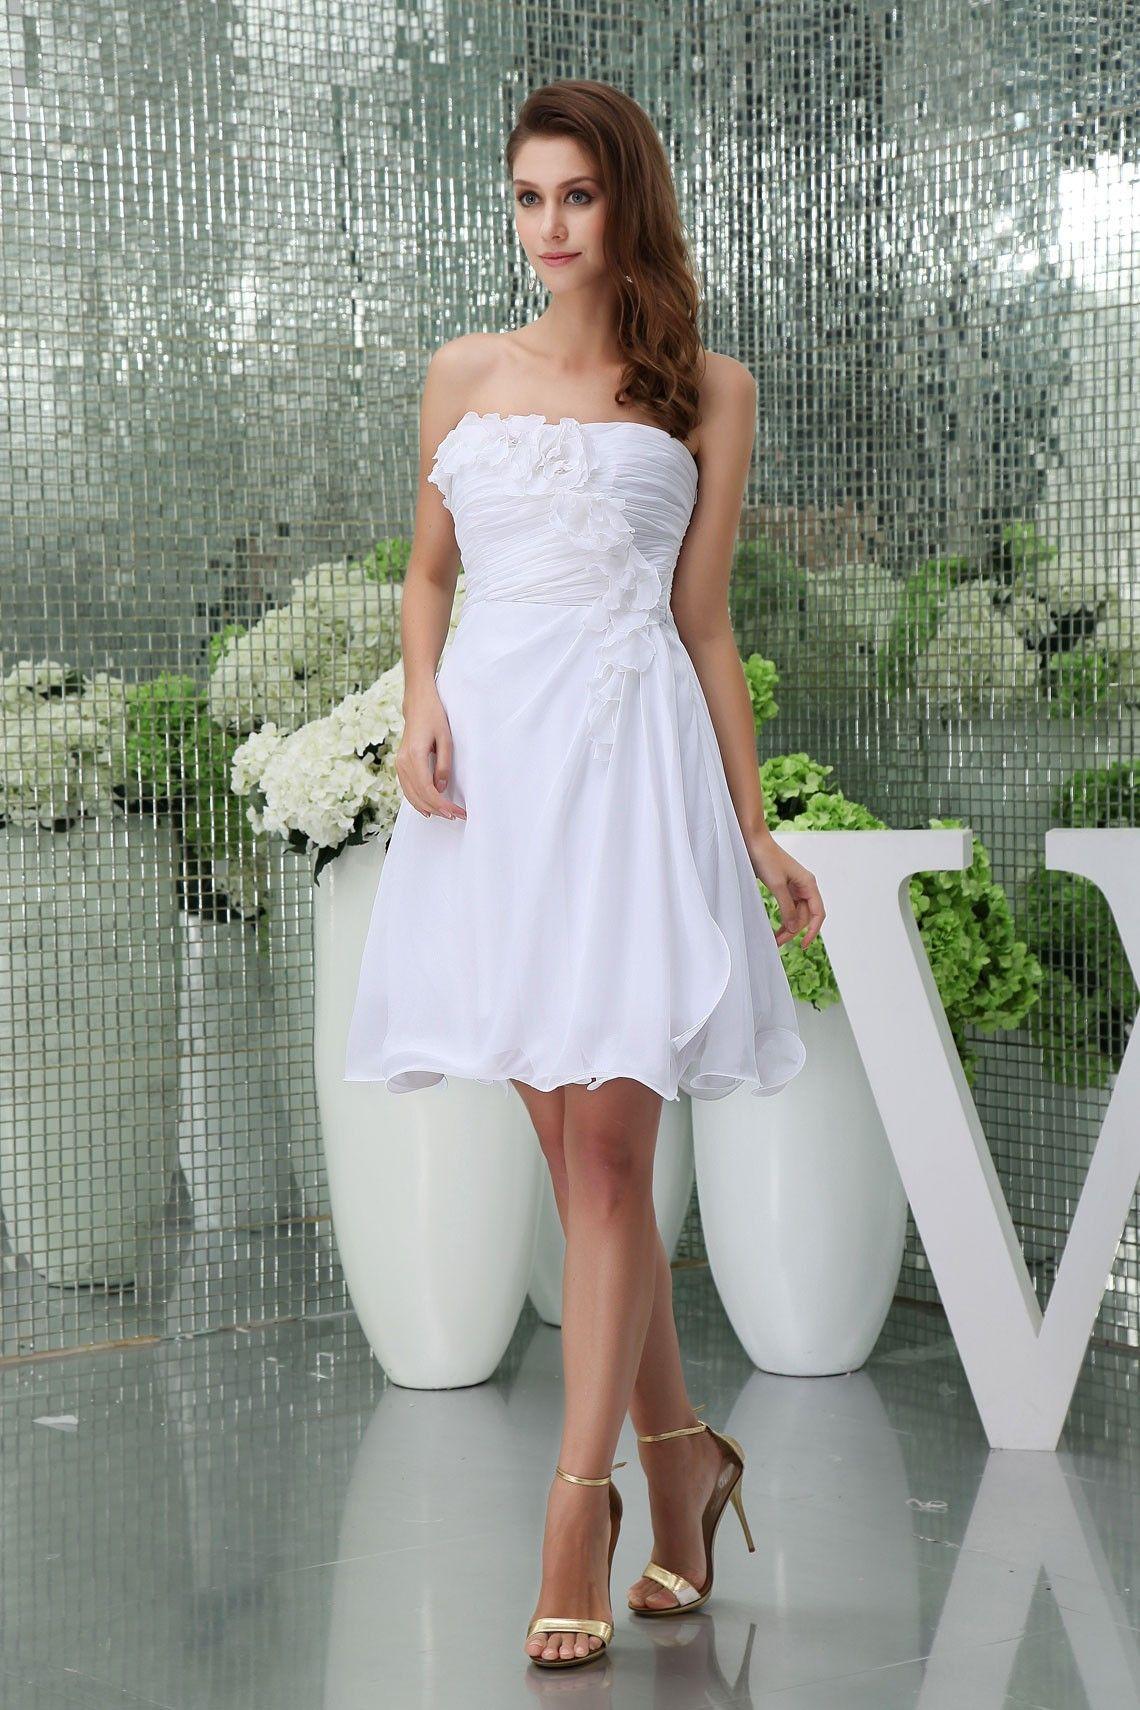 Mini white wedding dress  Strapless Short Aline Flowers Pleated Chiffon Bridesmaid Dress